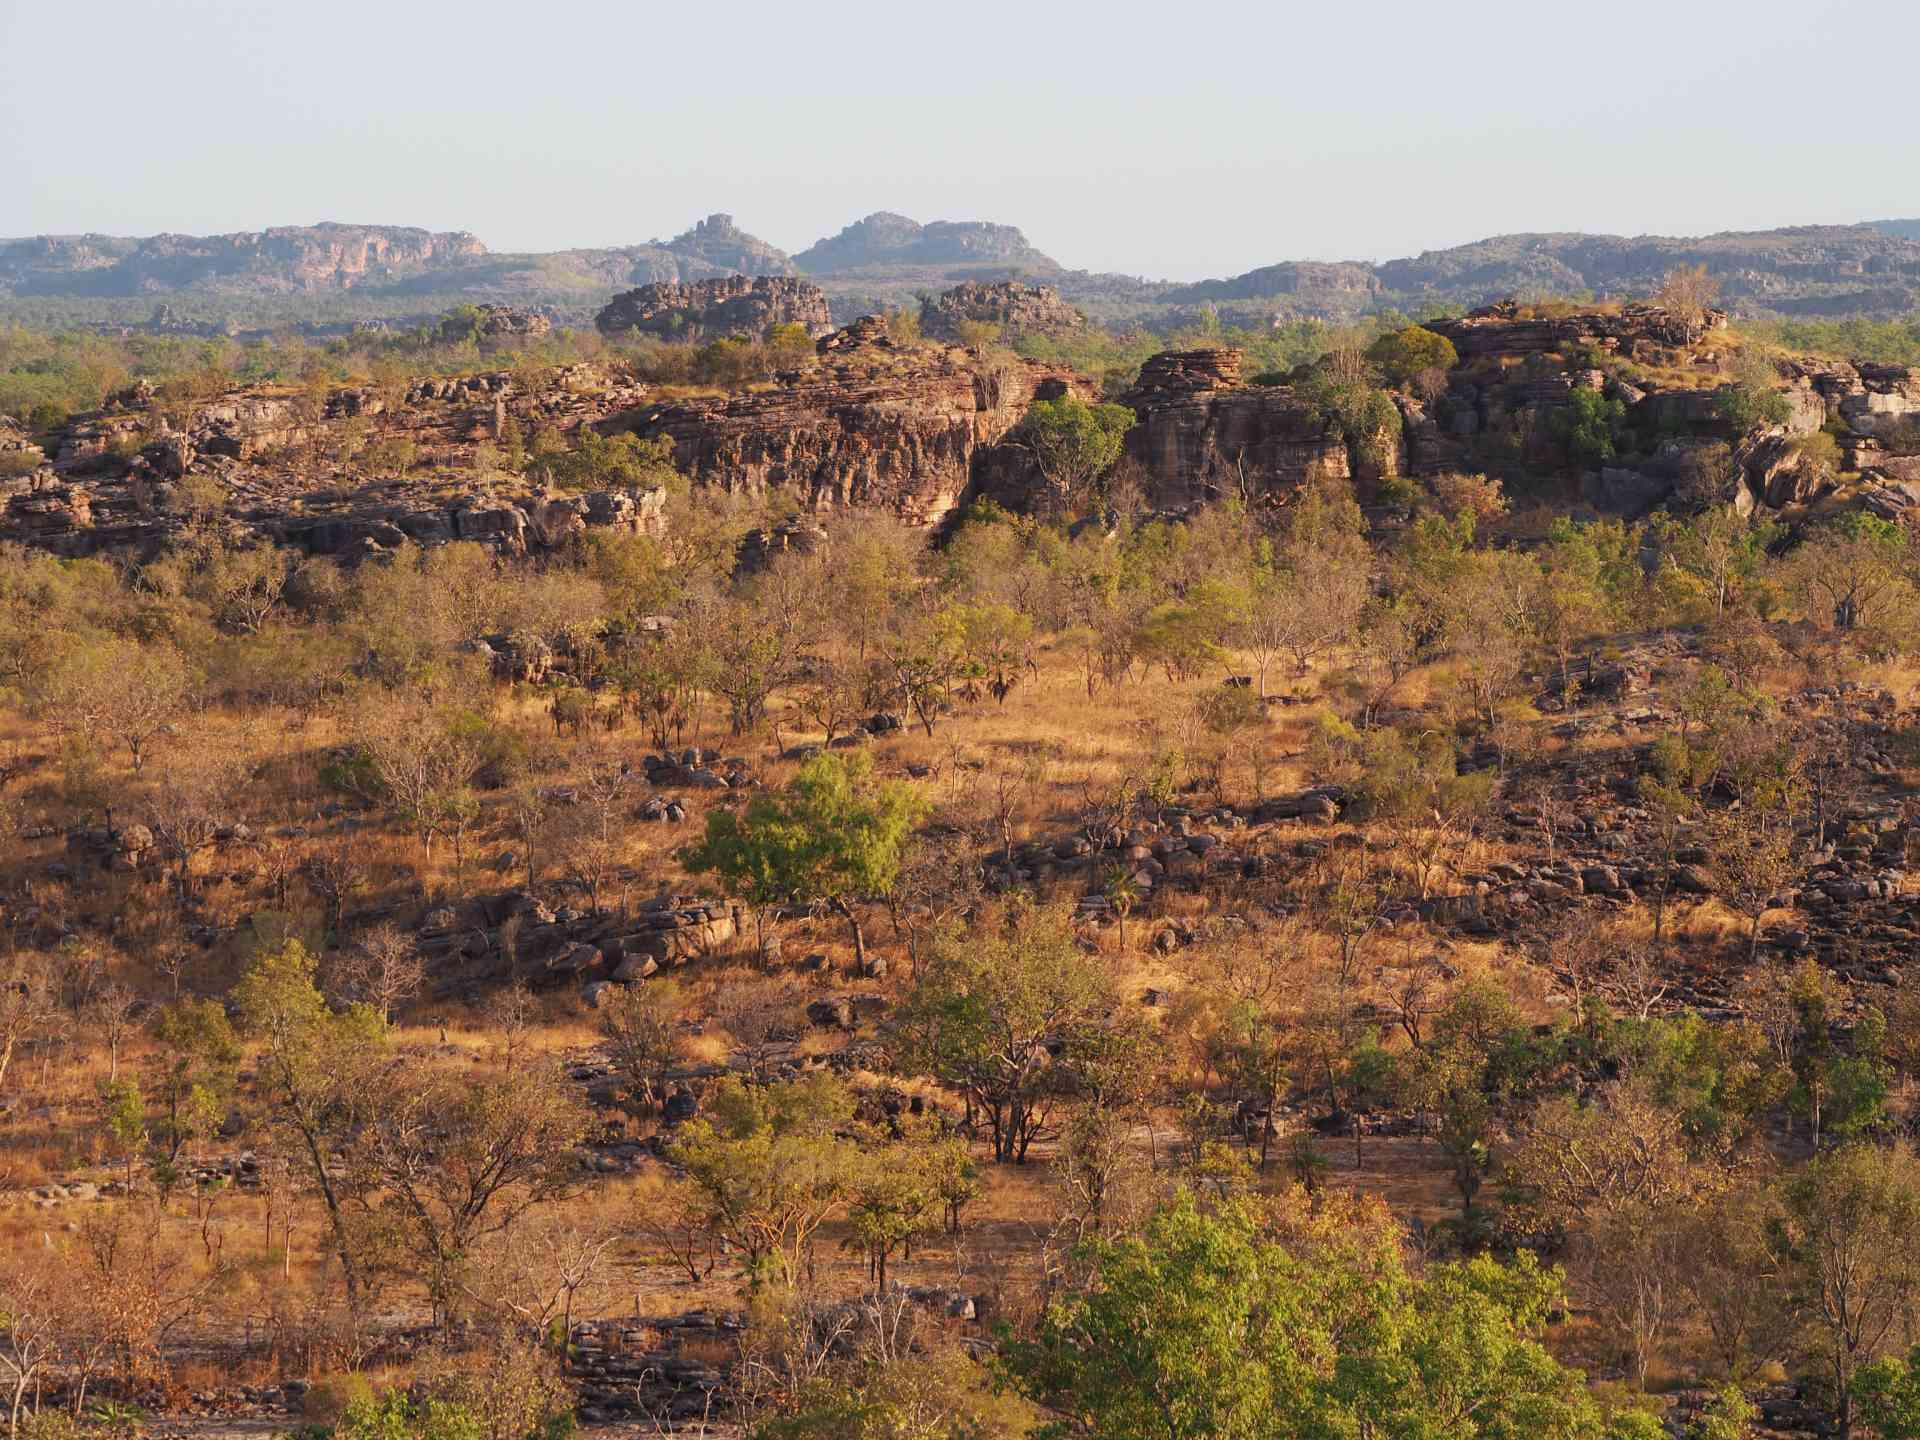 Ubirr walk, Kakadu, Northern Territory by Annelieke Huijgens